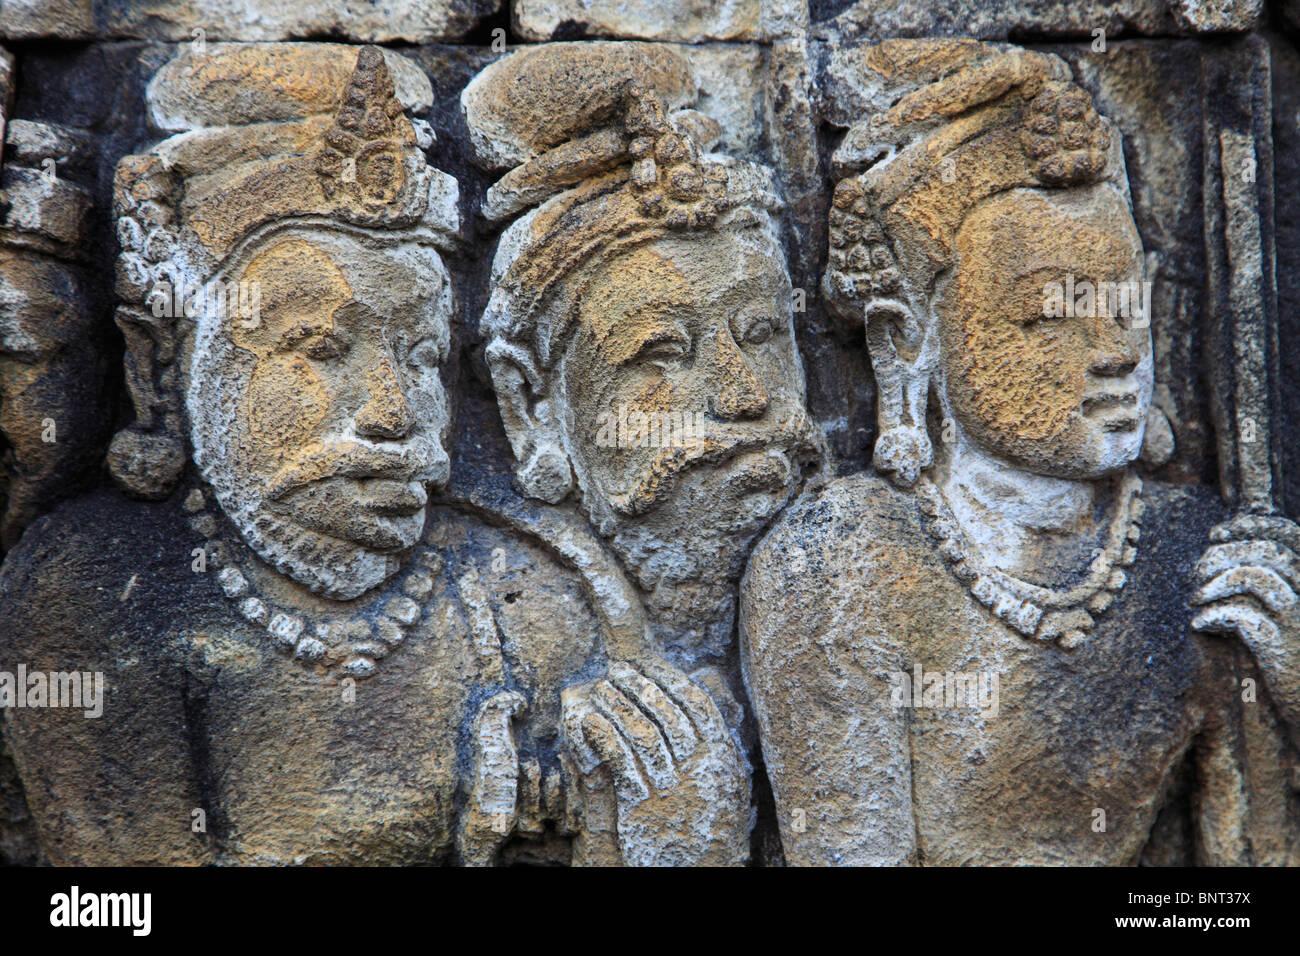 Indonesia java borobudur temple sculpture stone